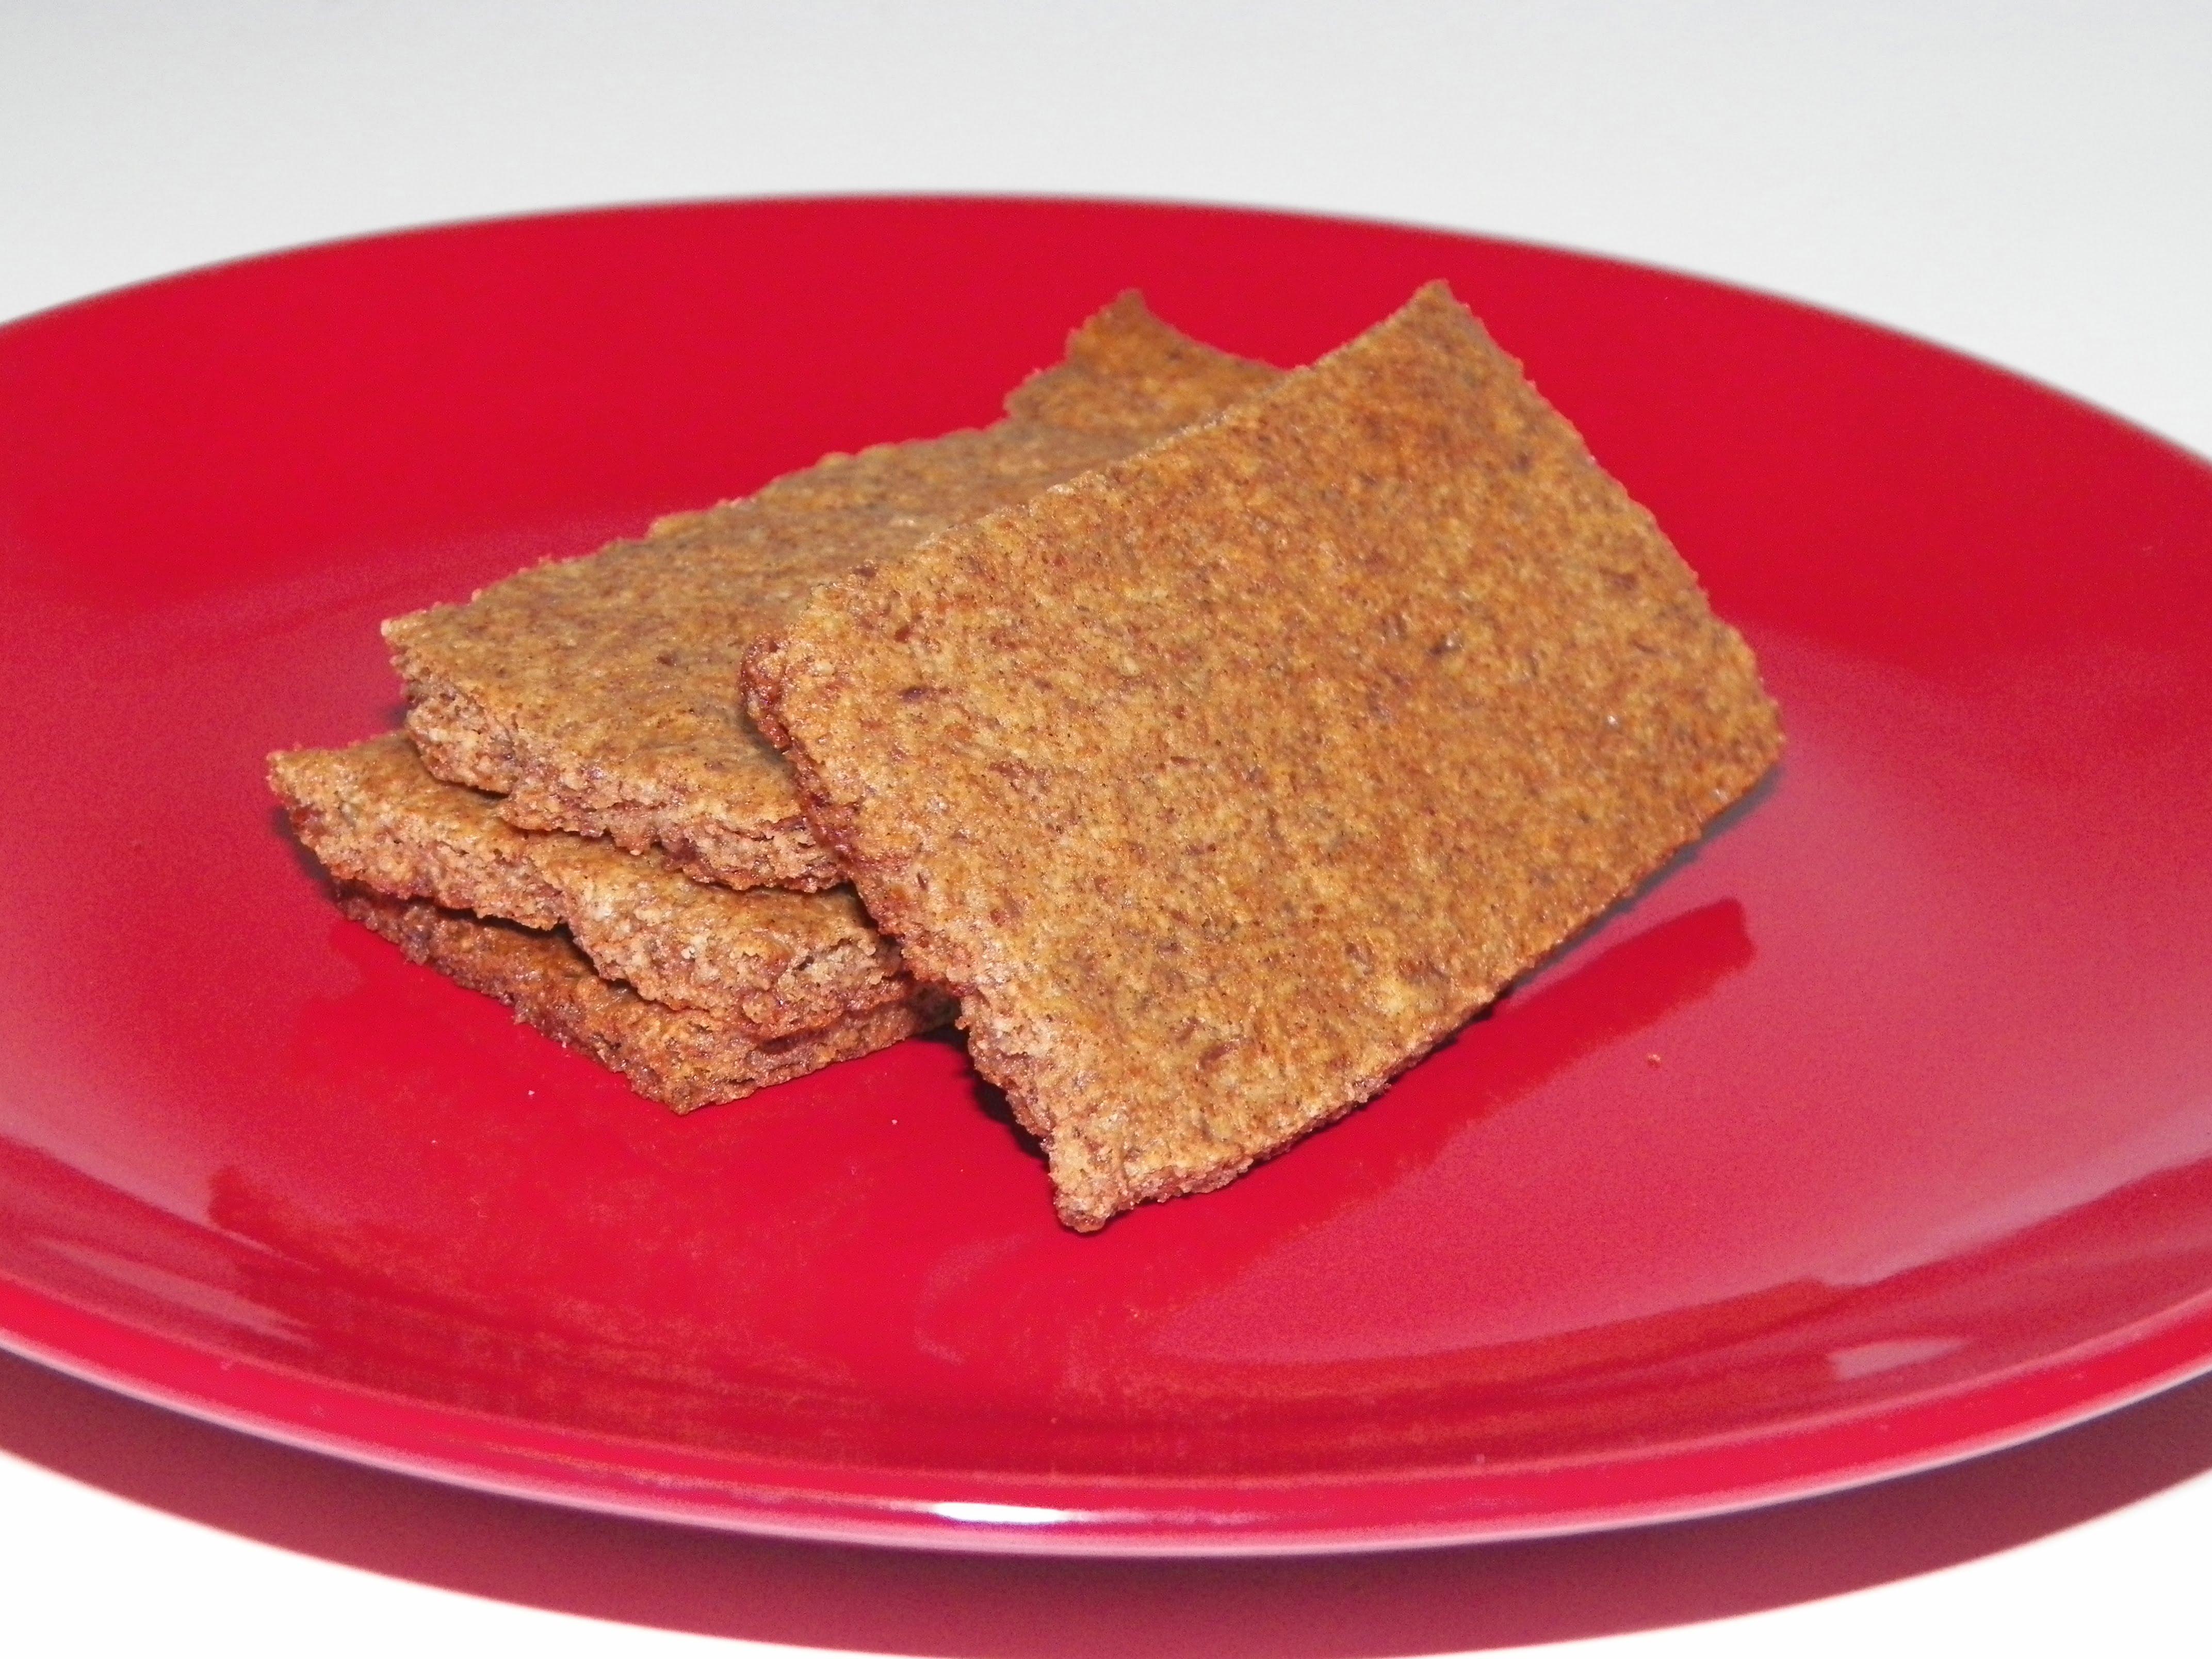 ... Graham Crackers – Grain Free, Gluten Free | My Gluten Free